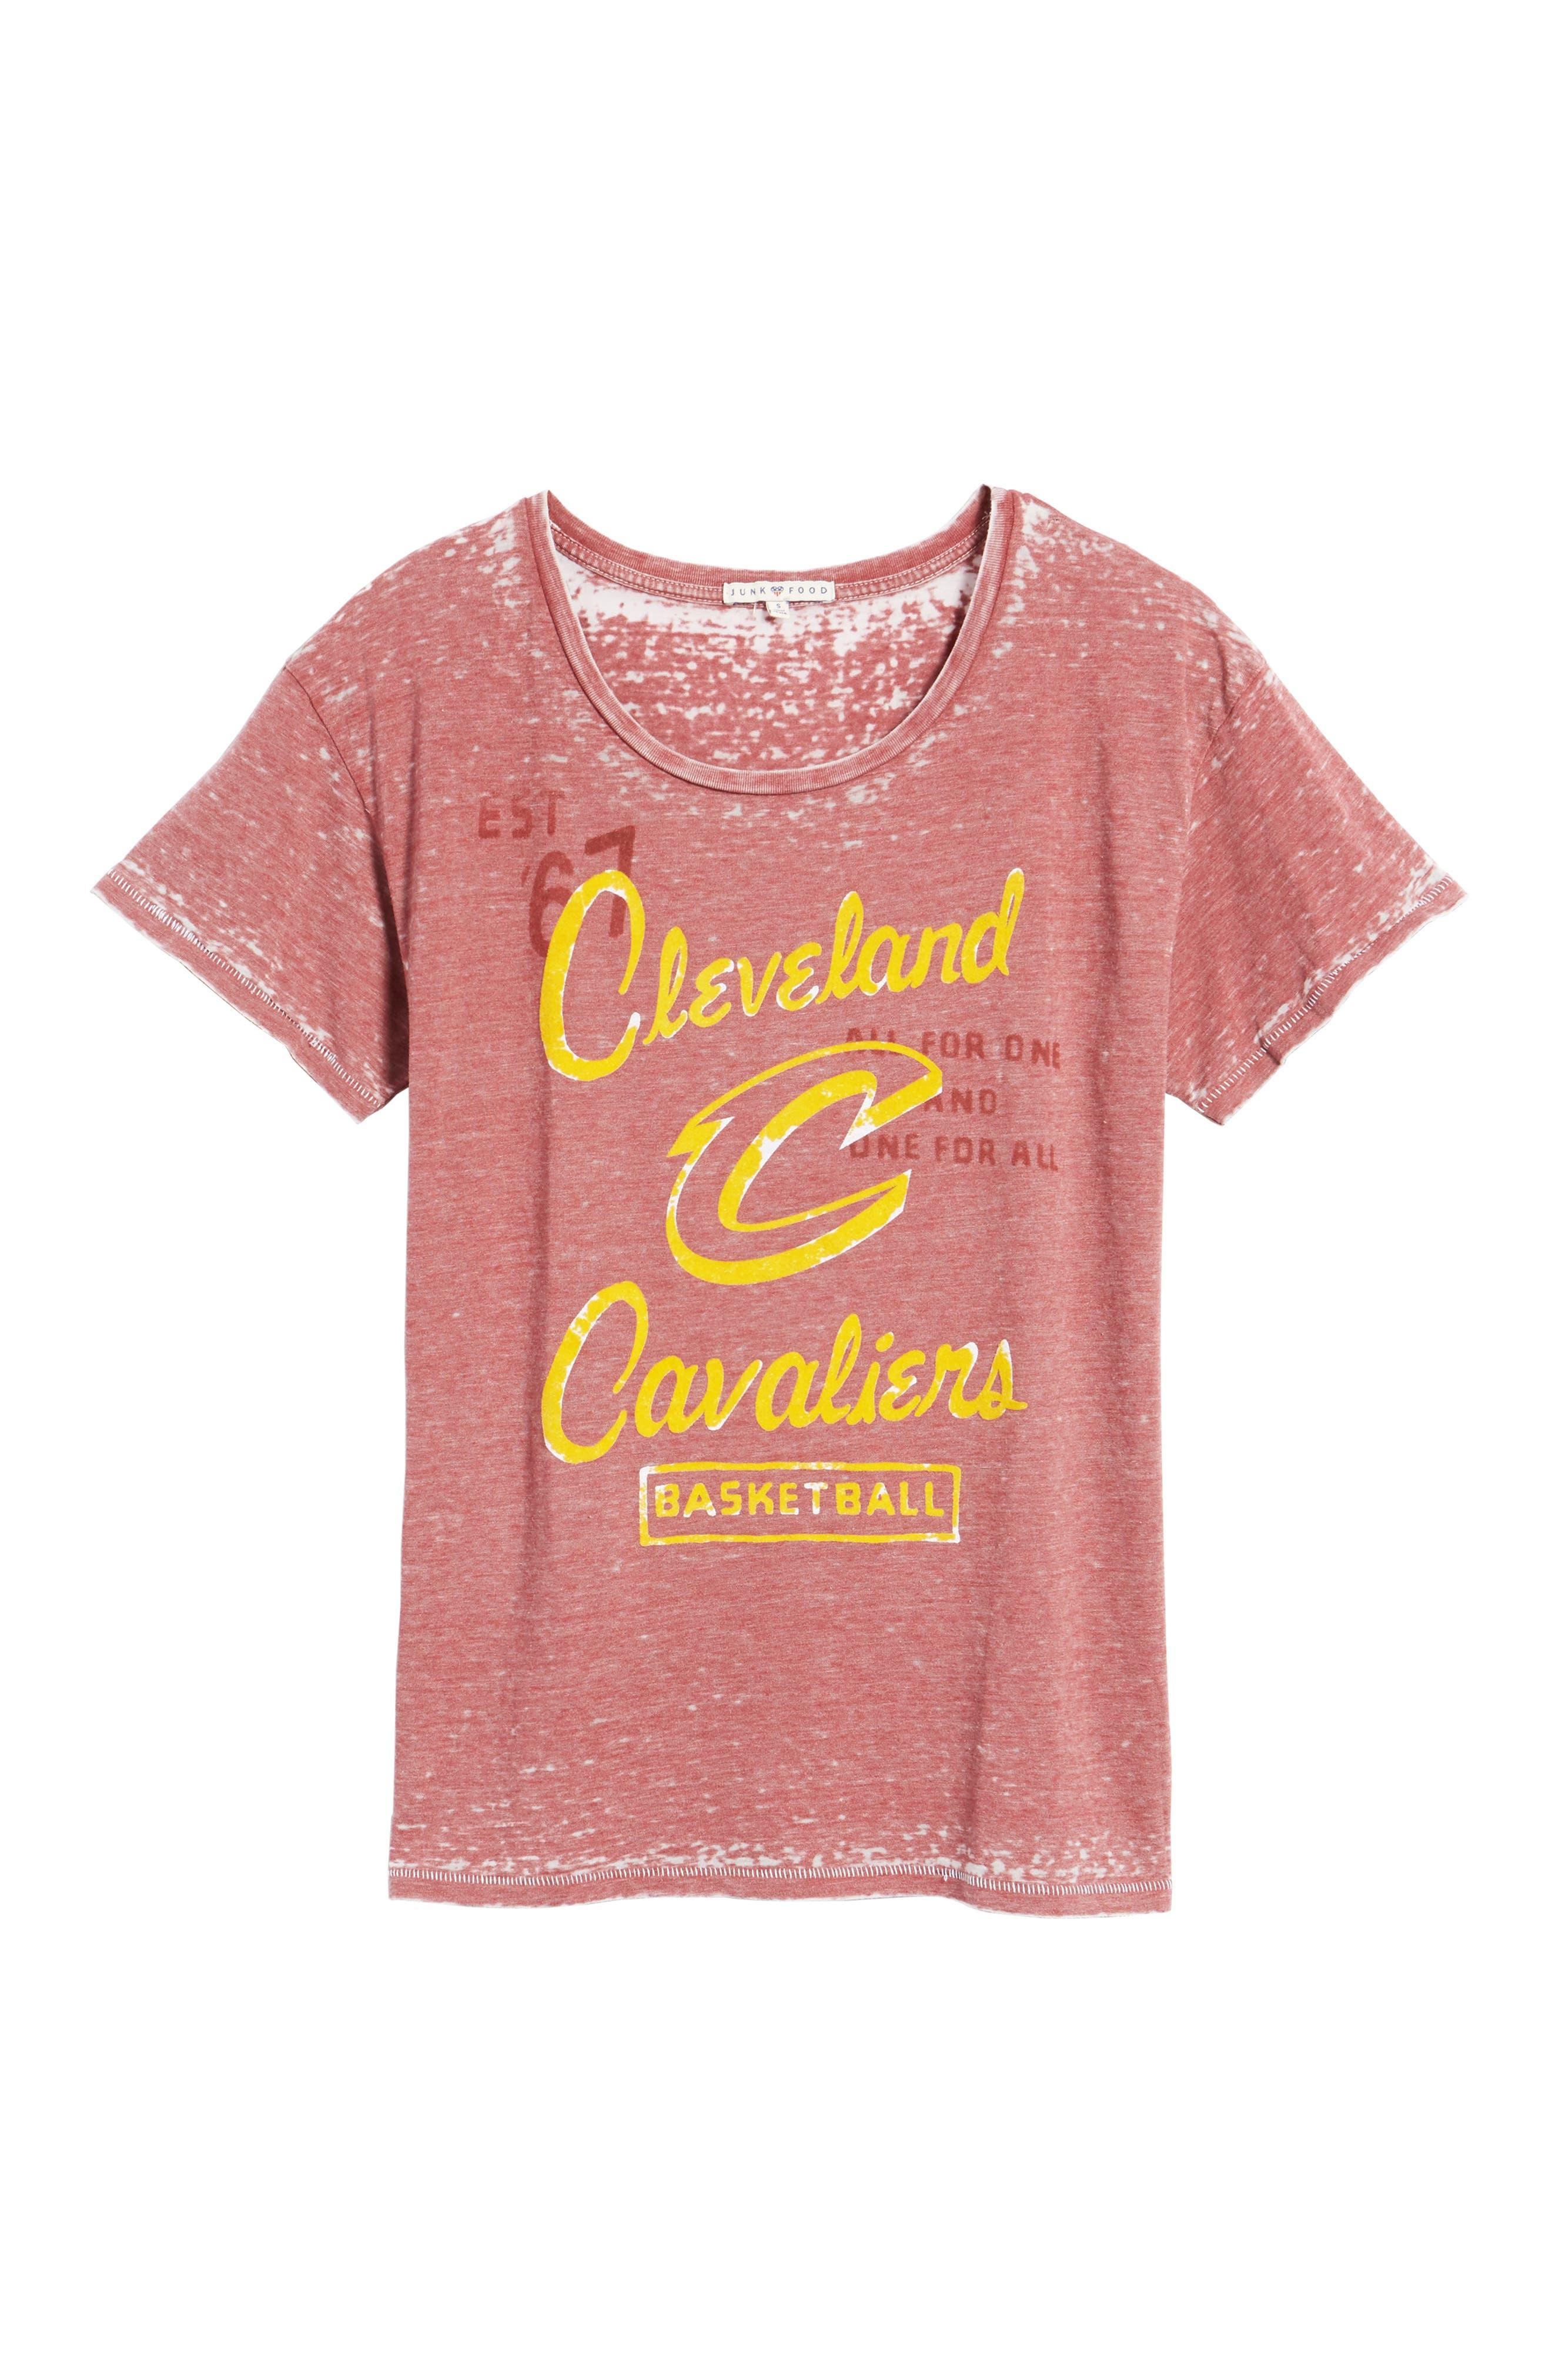 NBA Cleveland Cavaliers Tee,                             Alternate thumbnail 6, color,                             933